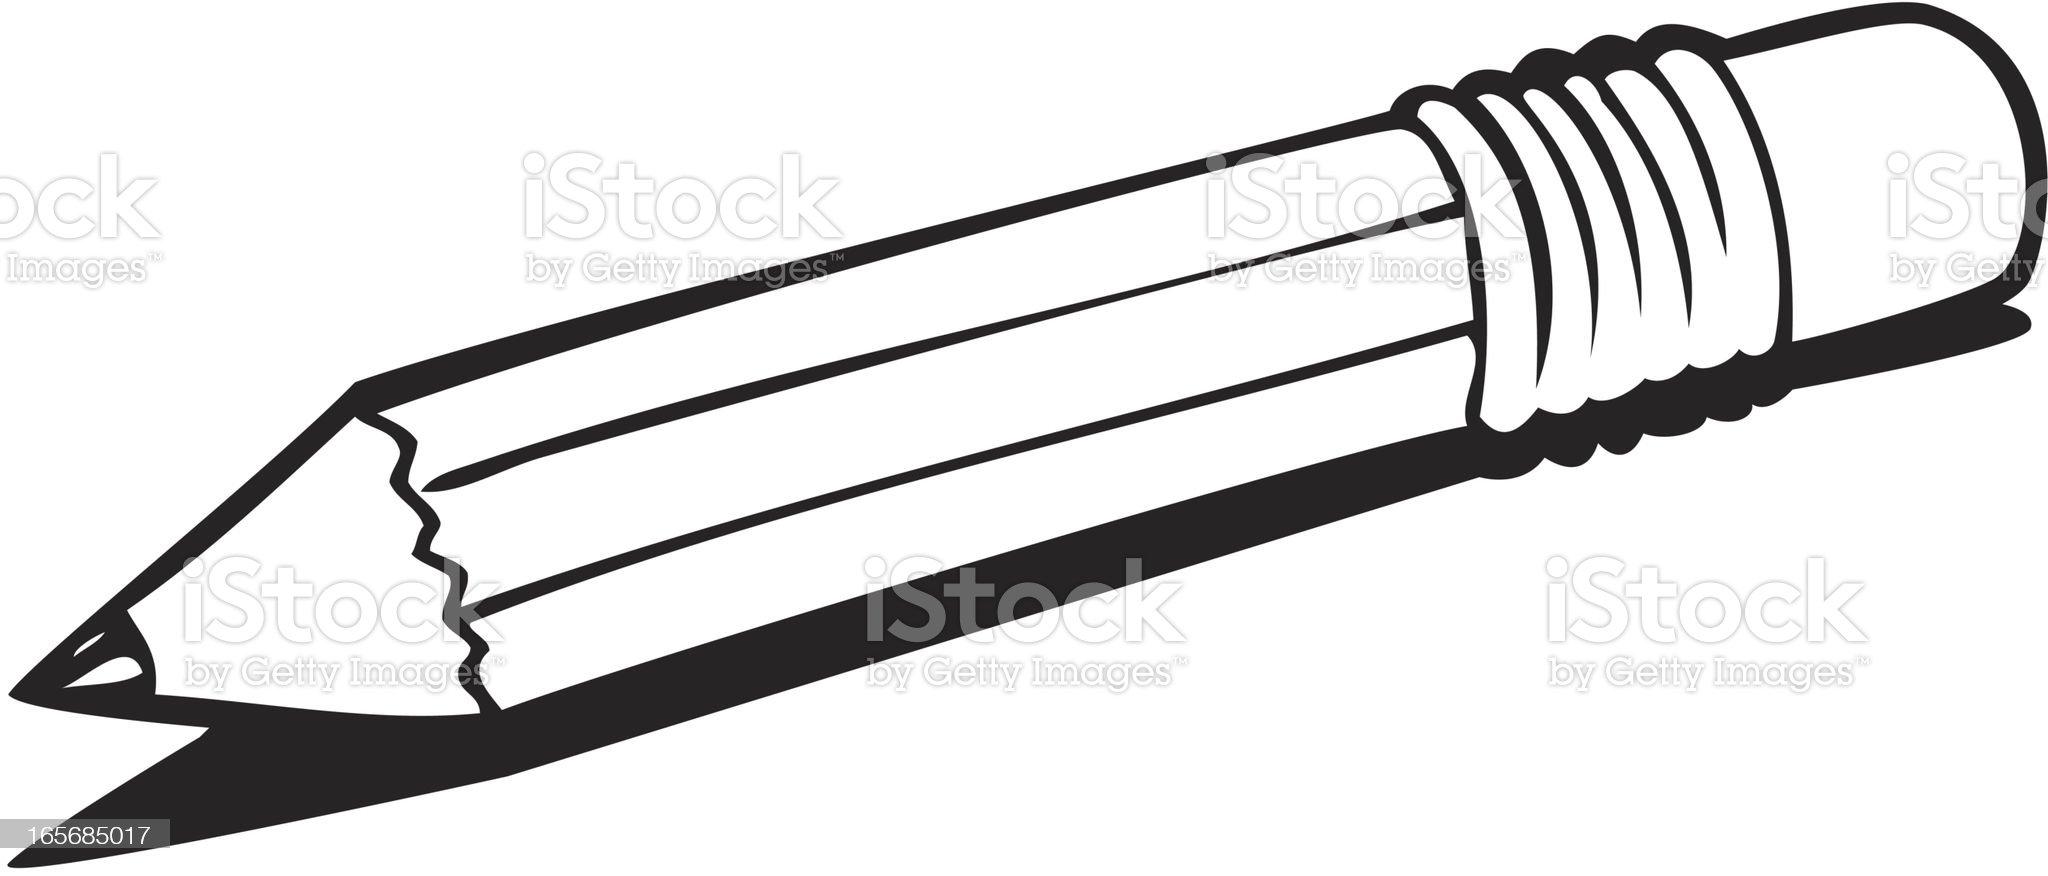 Pencil Line Art royalty-free stock vector art